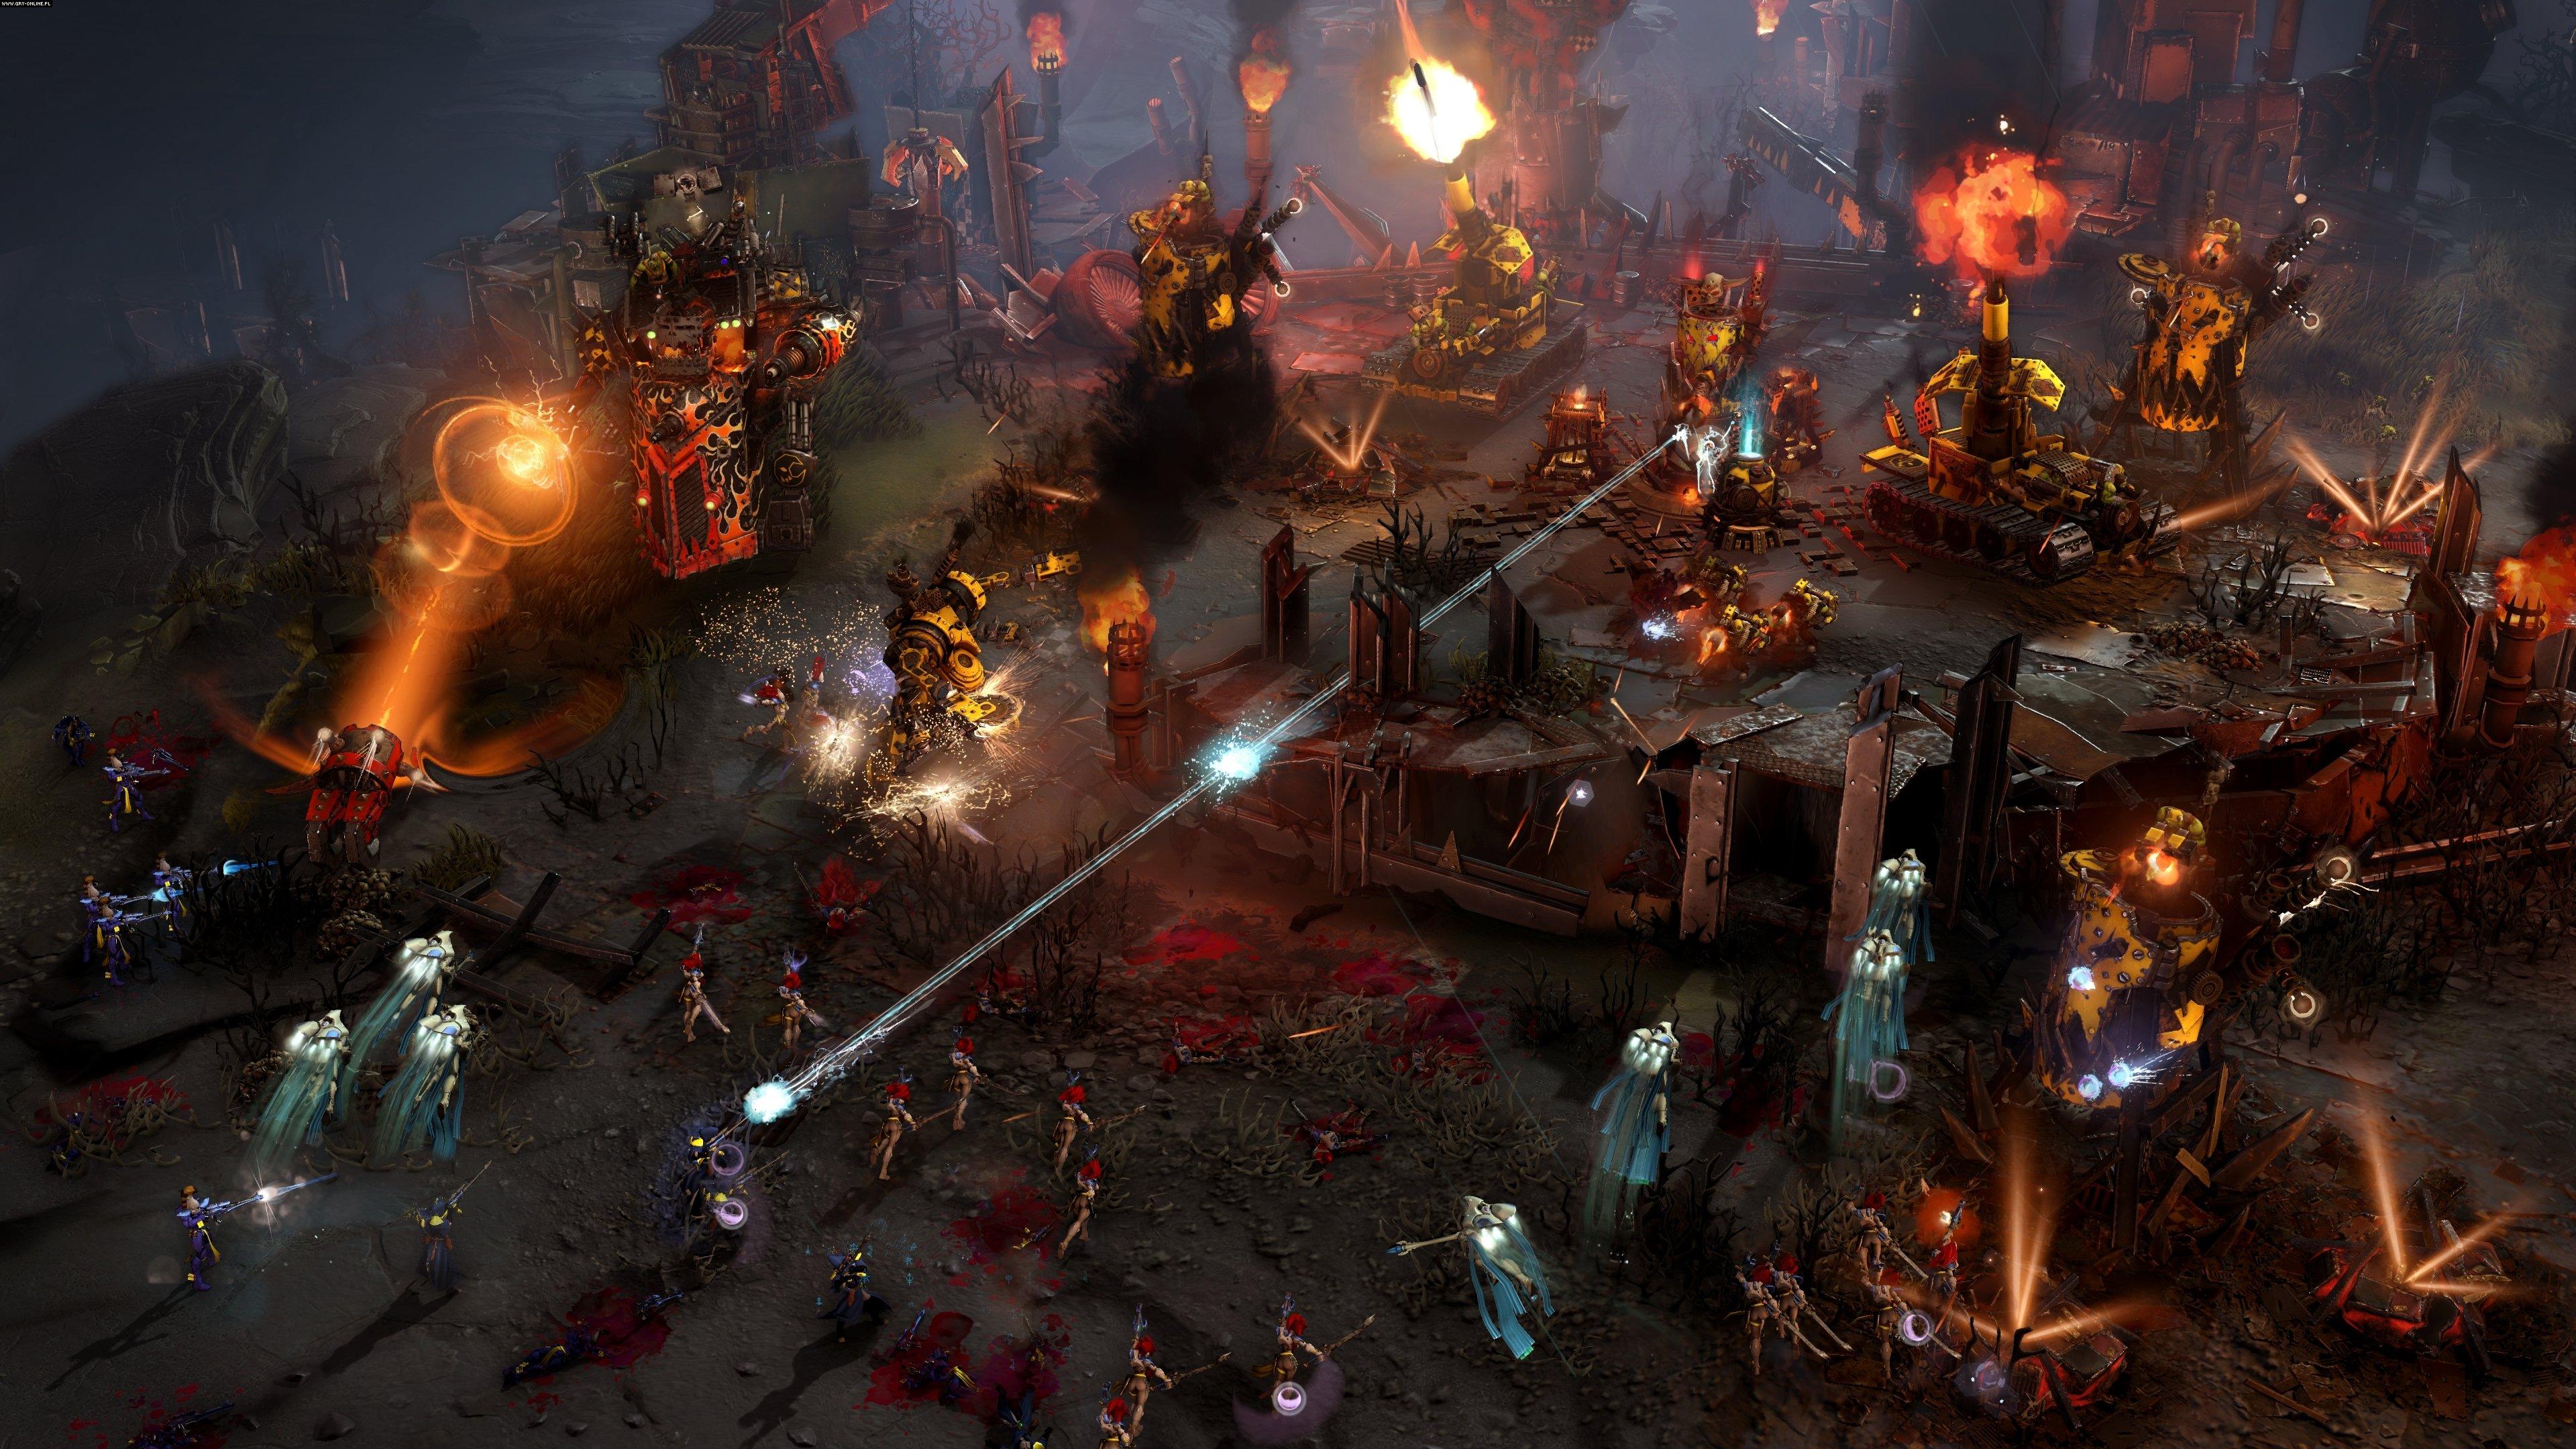 Warhammer 40,000: Dawn of War III PC Games Image 8/32, Relic Entertainment, SEGA